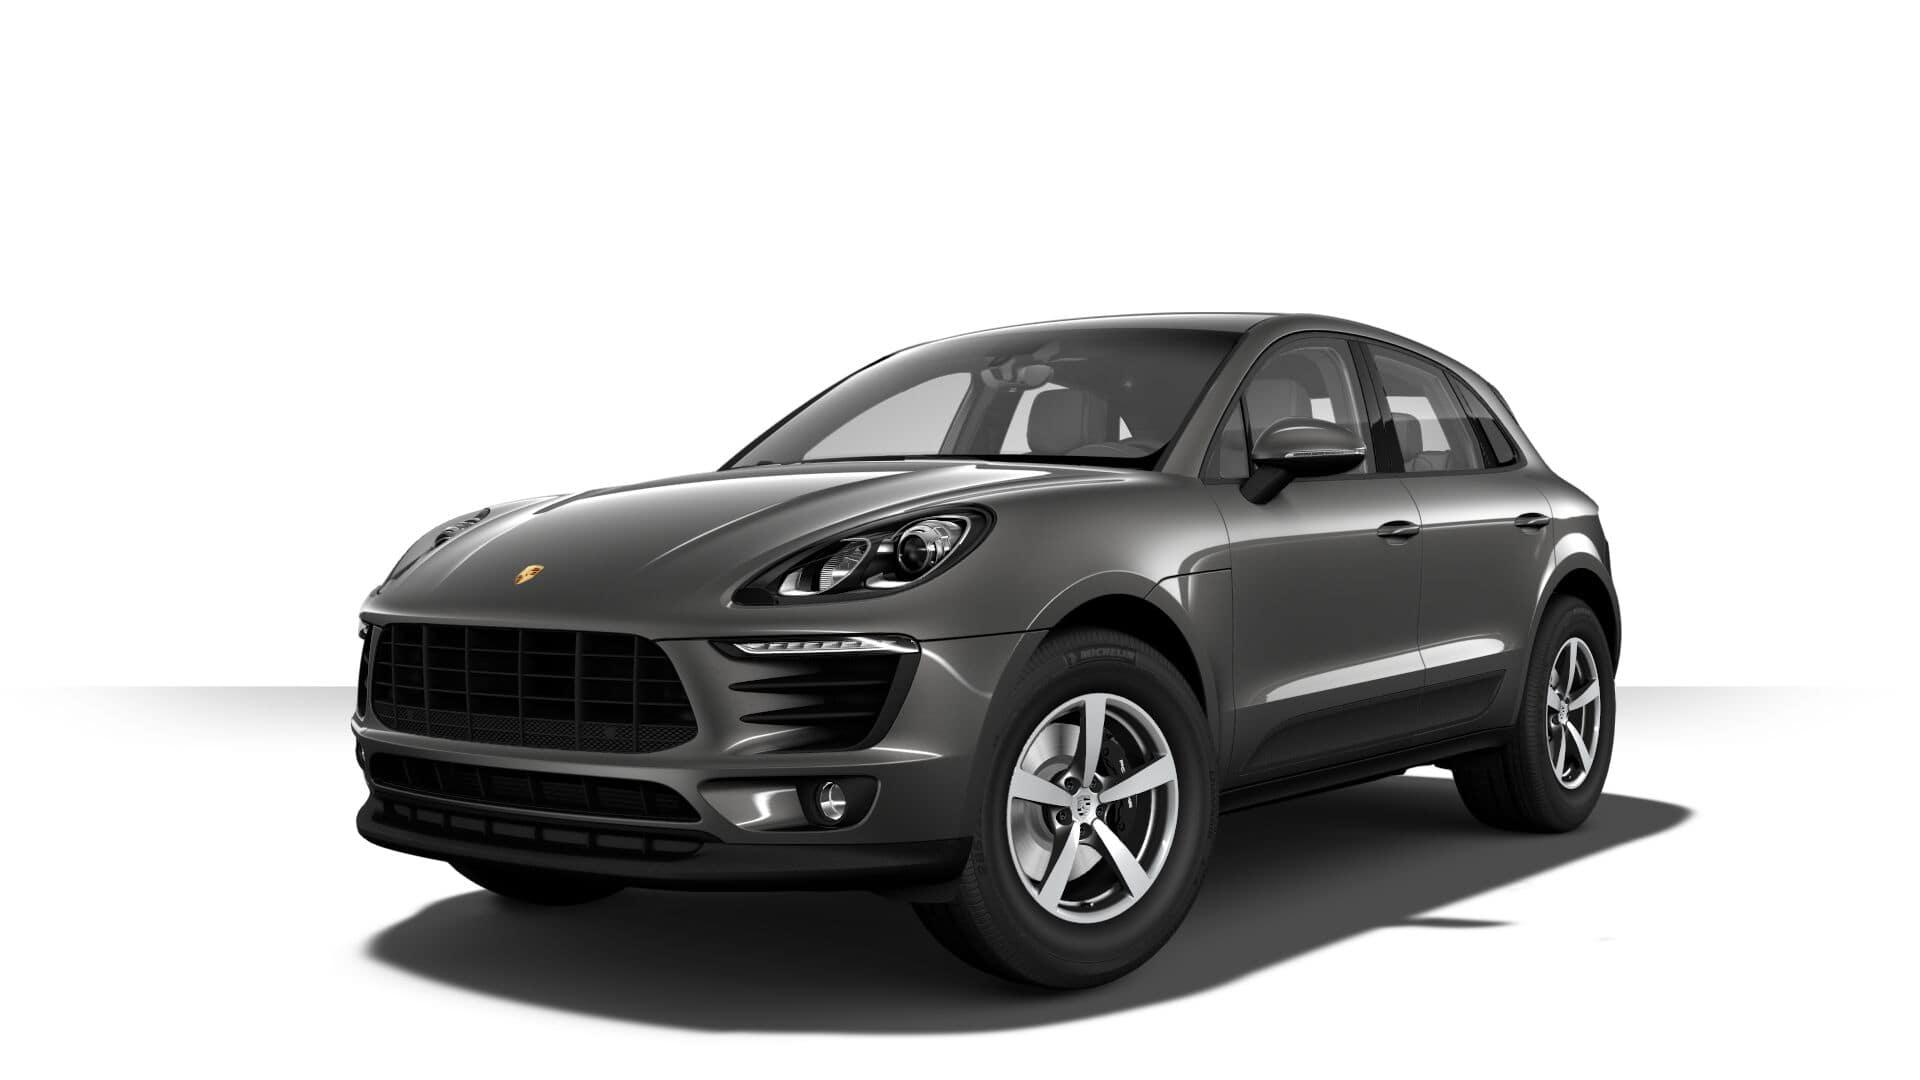 Porsche Macan Agate Grey Metallic